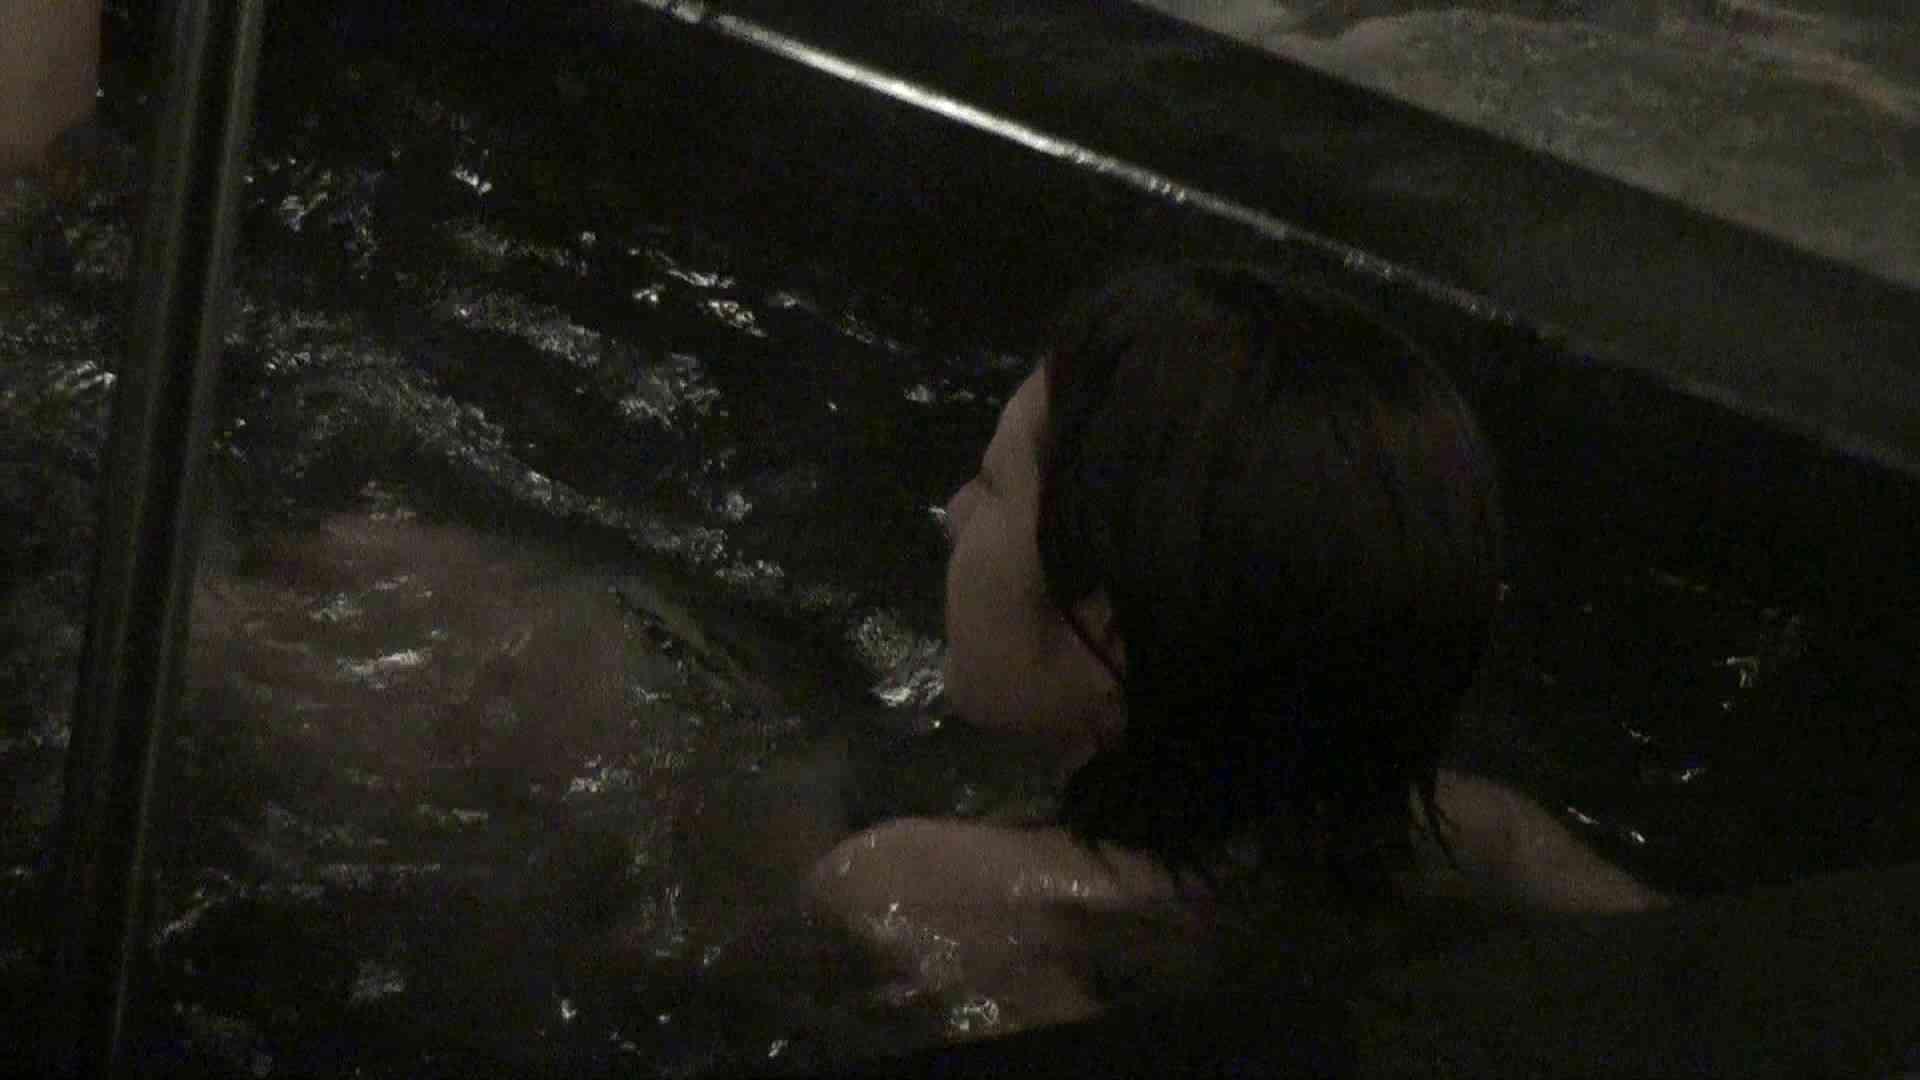 Aquaな露天風呂Vol.411 盗撮 | HなOL  49pic 17